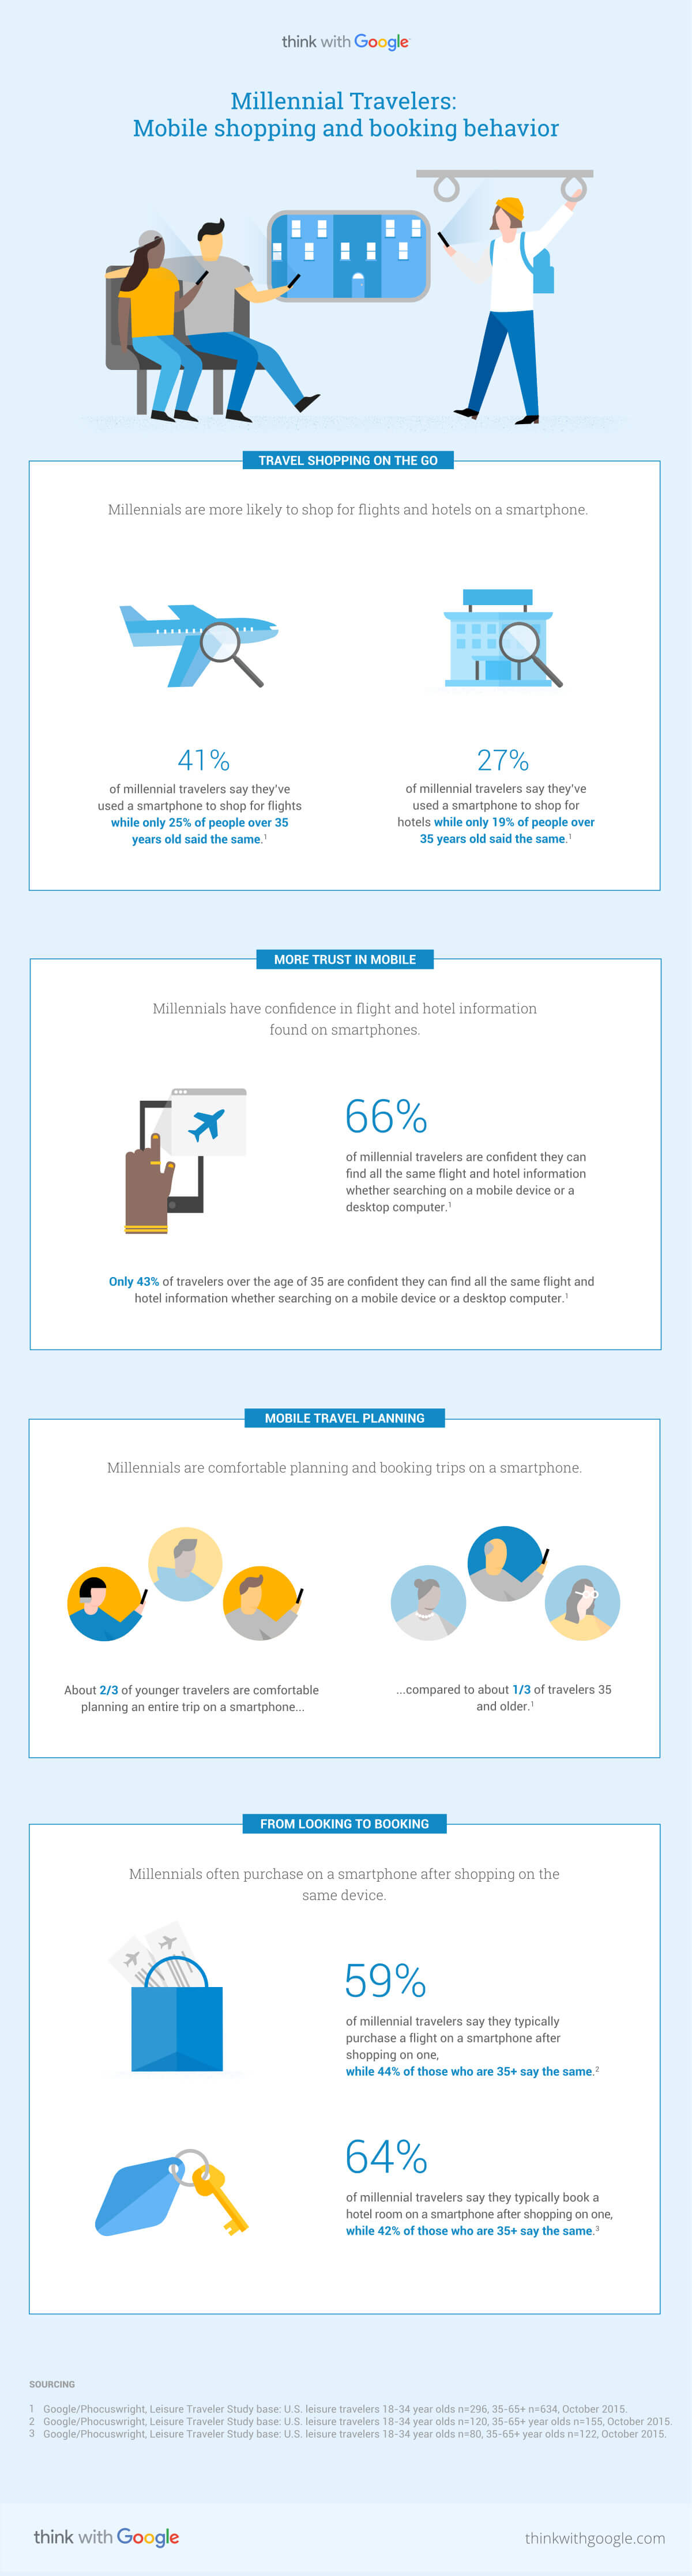 millennial-travelers-mobile-shopping-booking-behavior